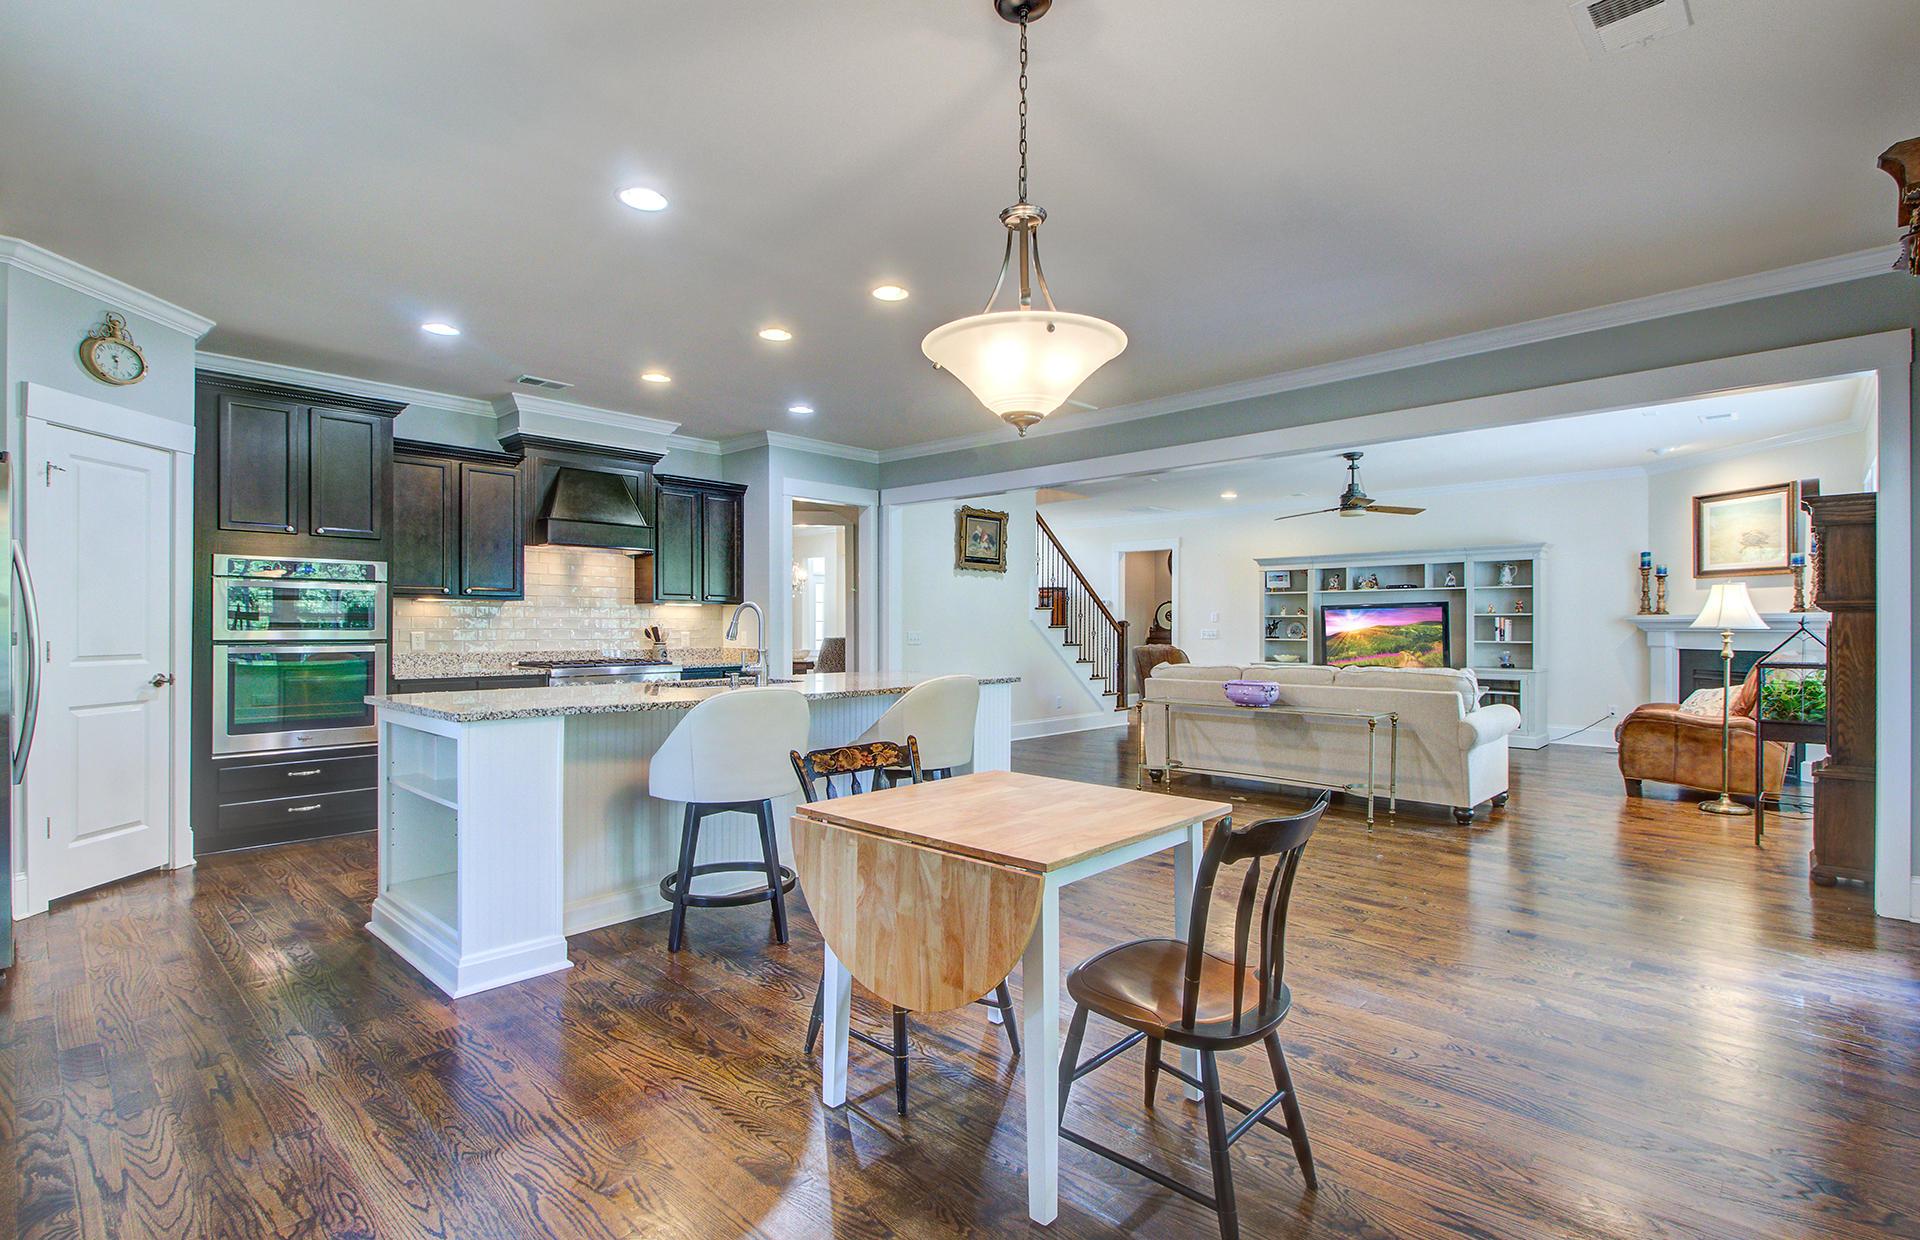 Scotts Creek Homes For Sale - 1404 Scotts Creek, Mount Pleasant, SC - 33